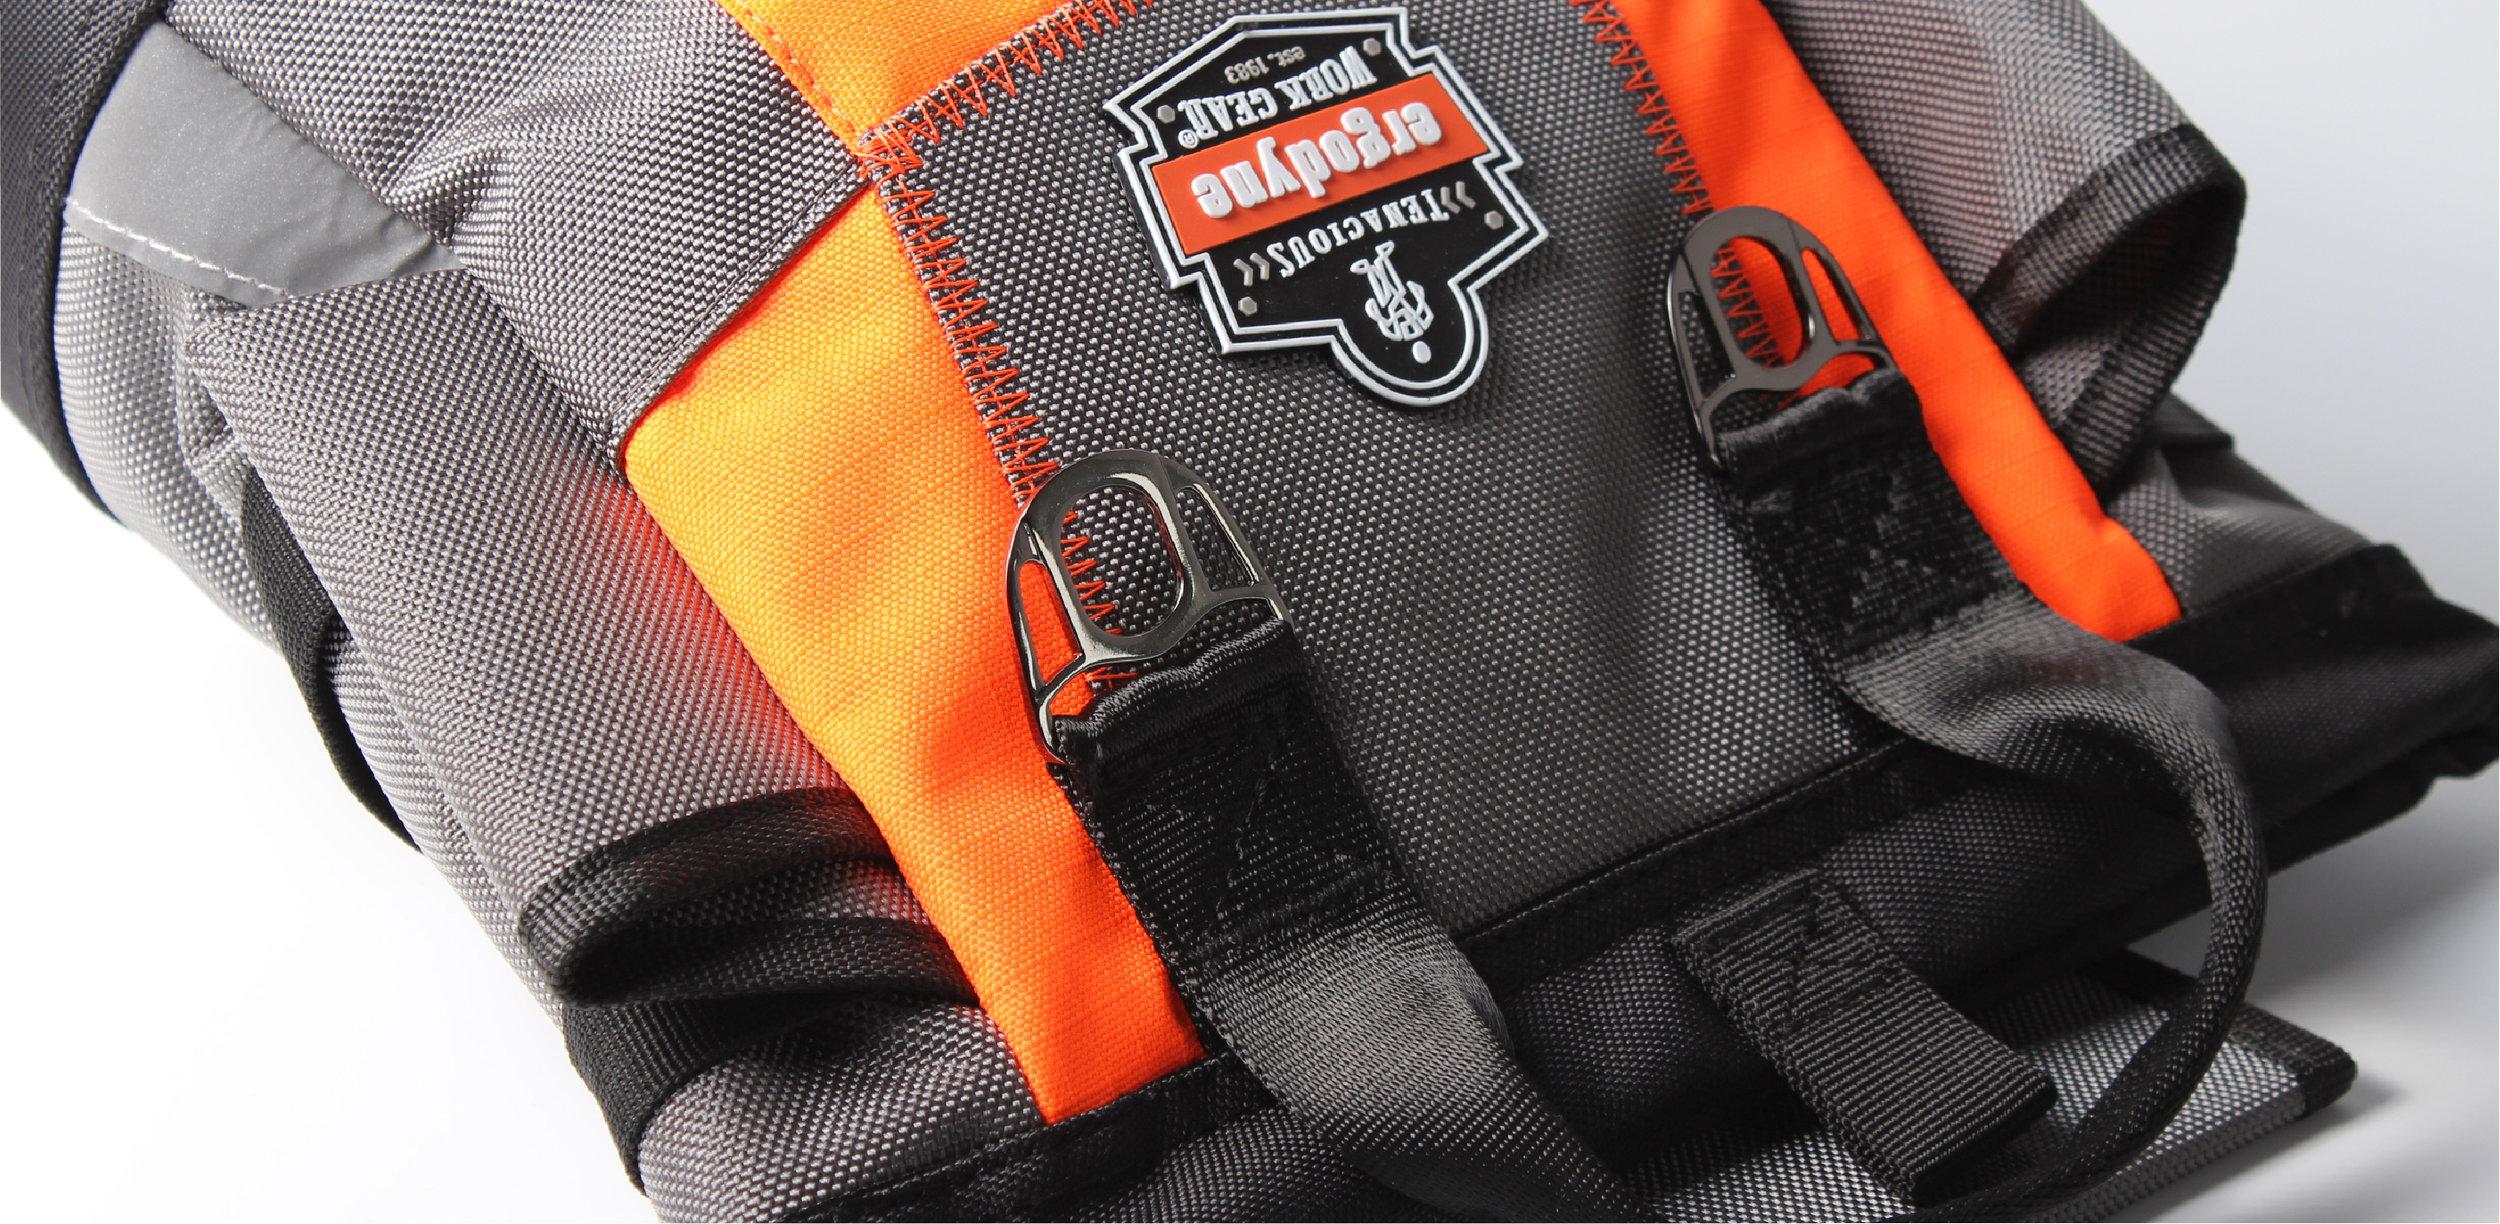 ergodyne-soft-good-industrial-work-pouch-design.jpg